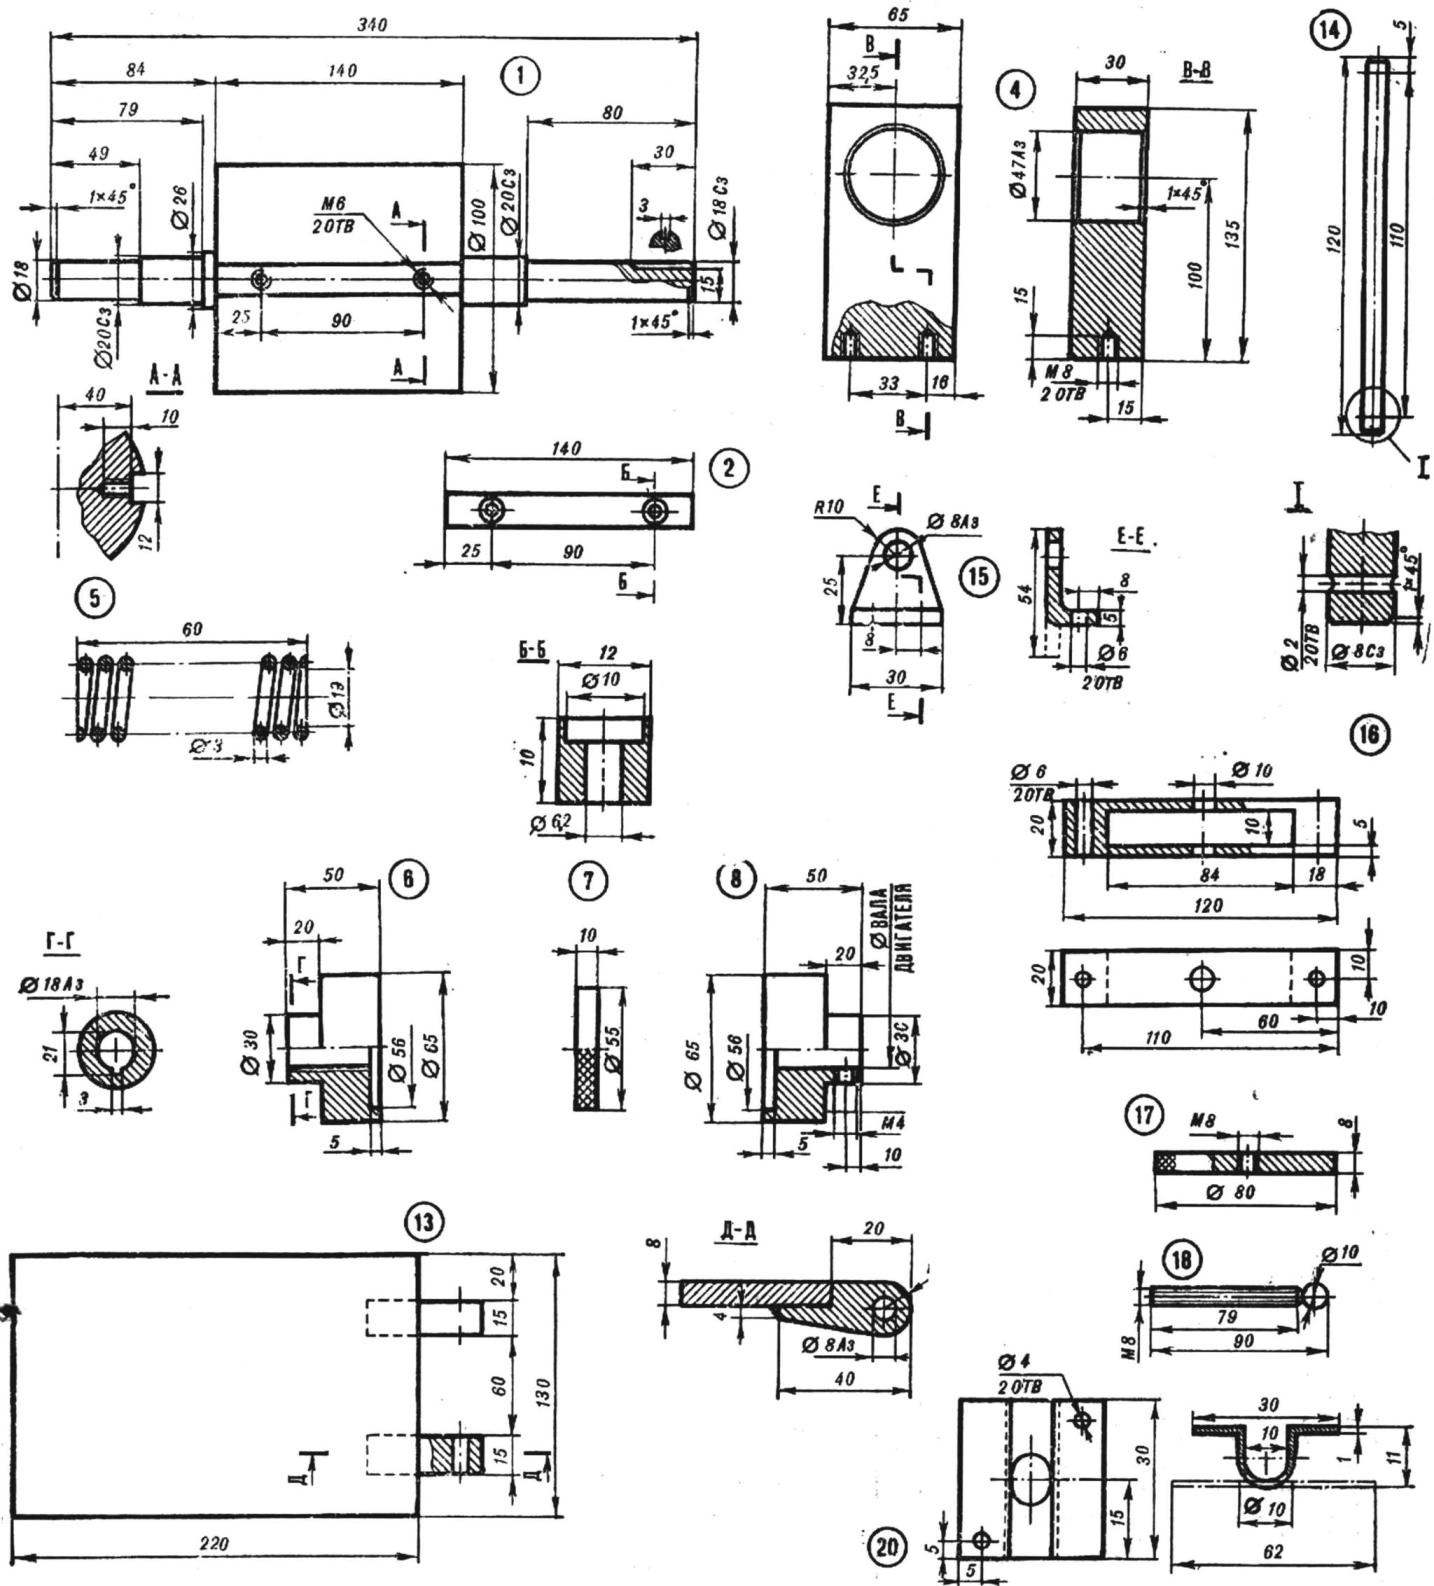 Компоновка деталей станка на станине